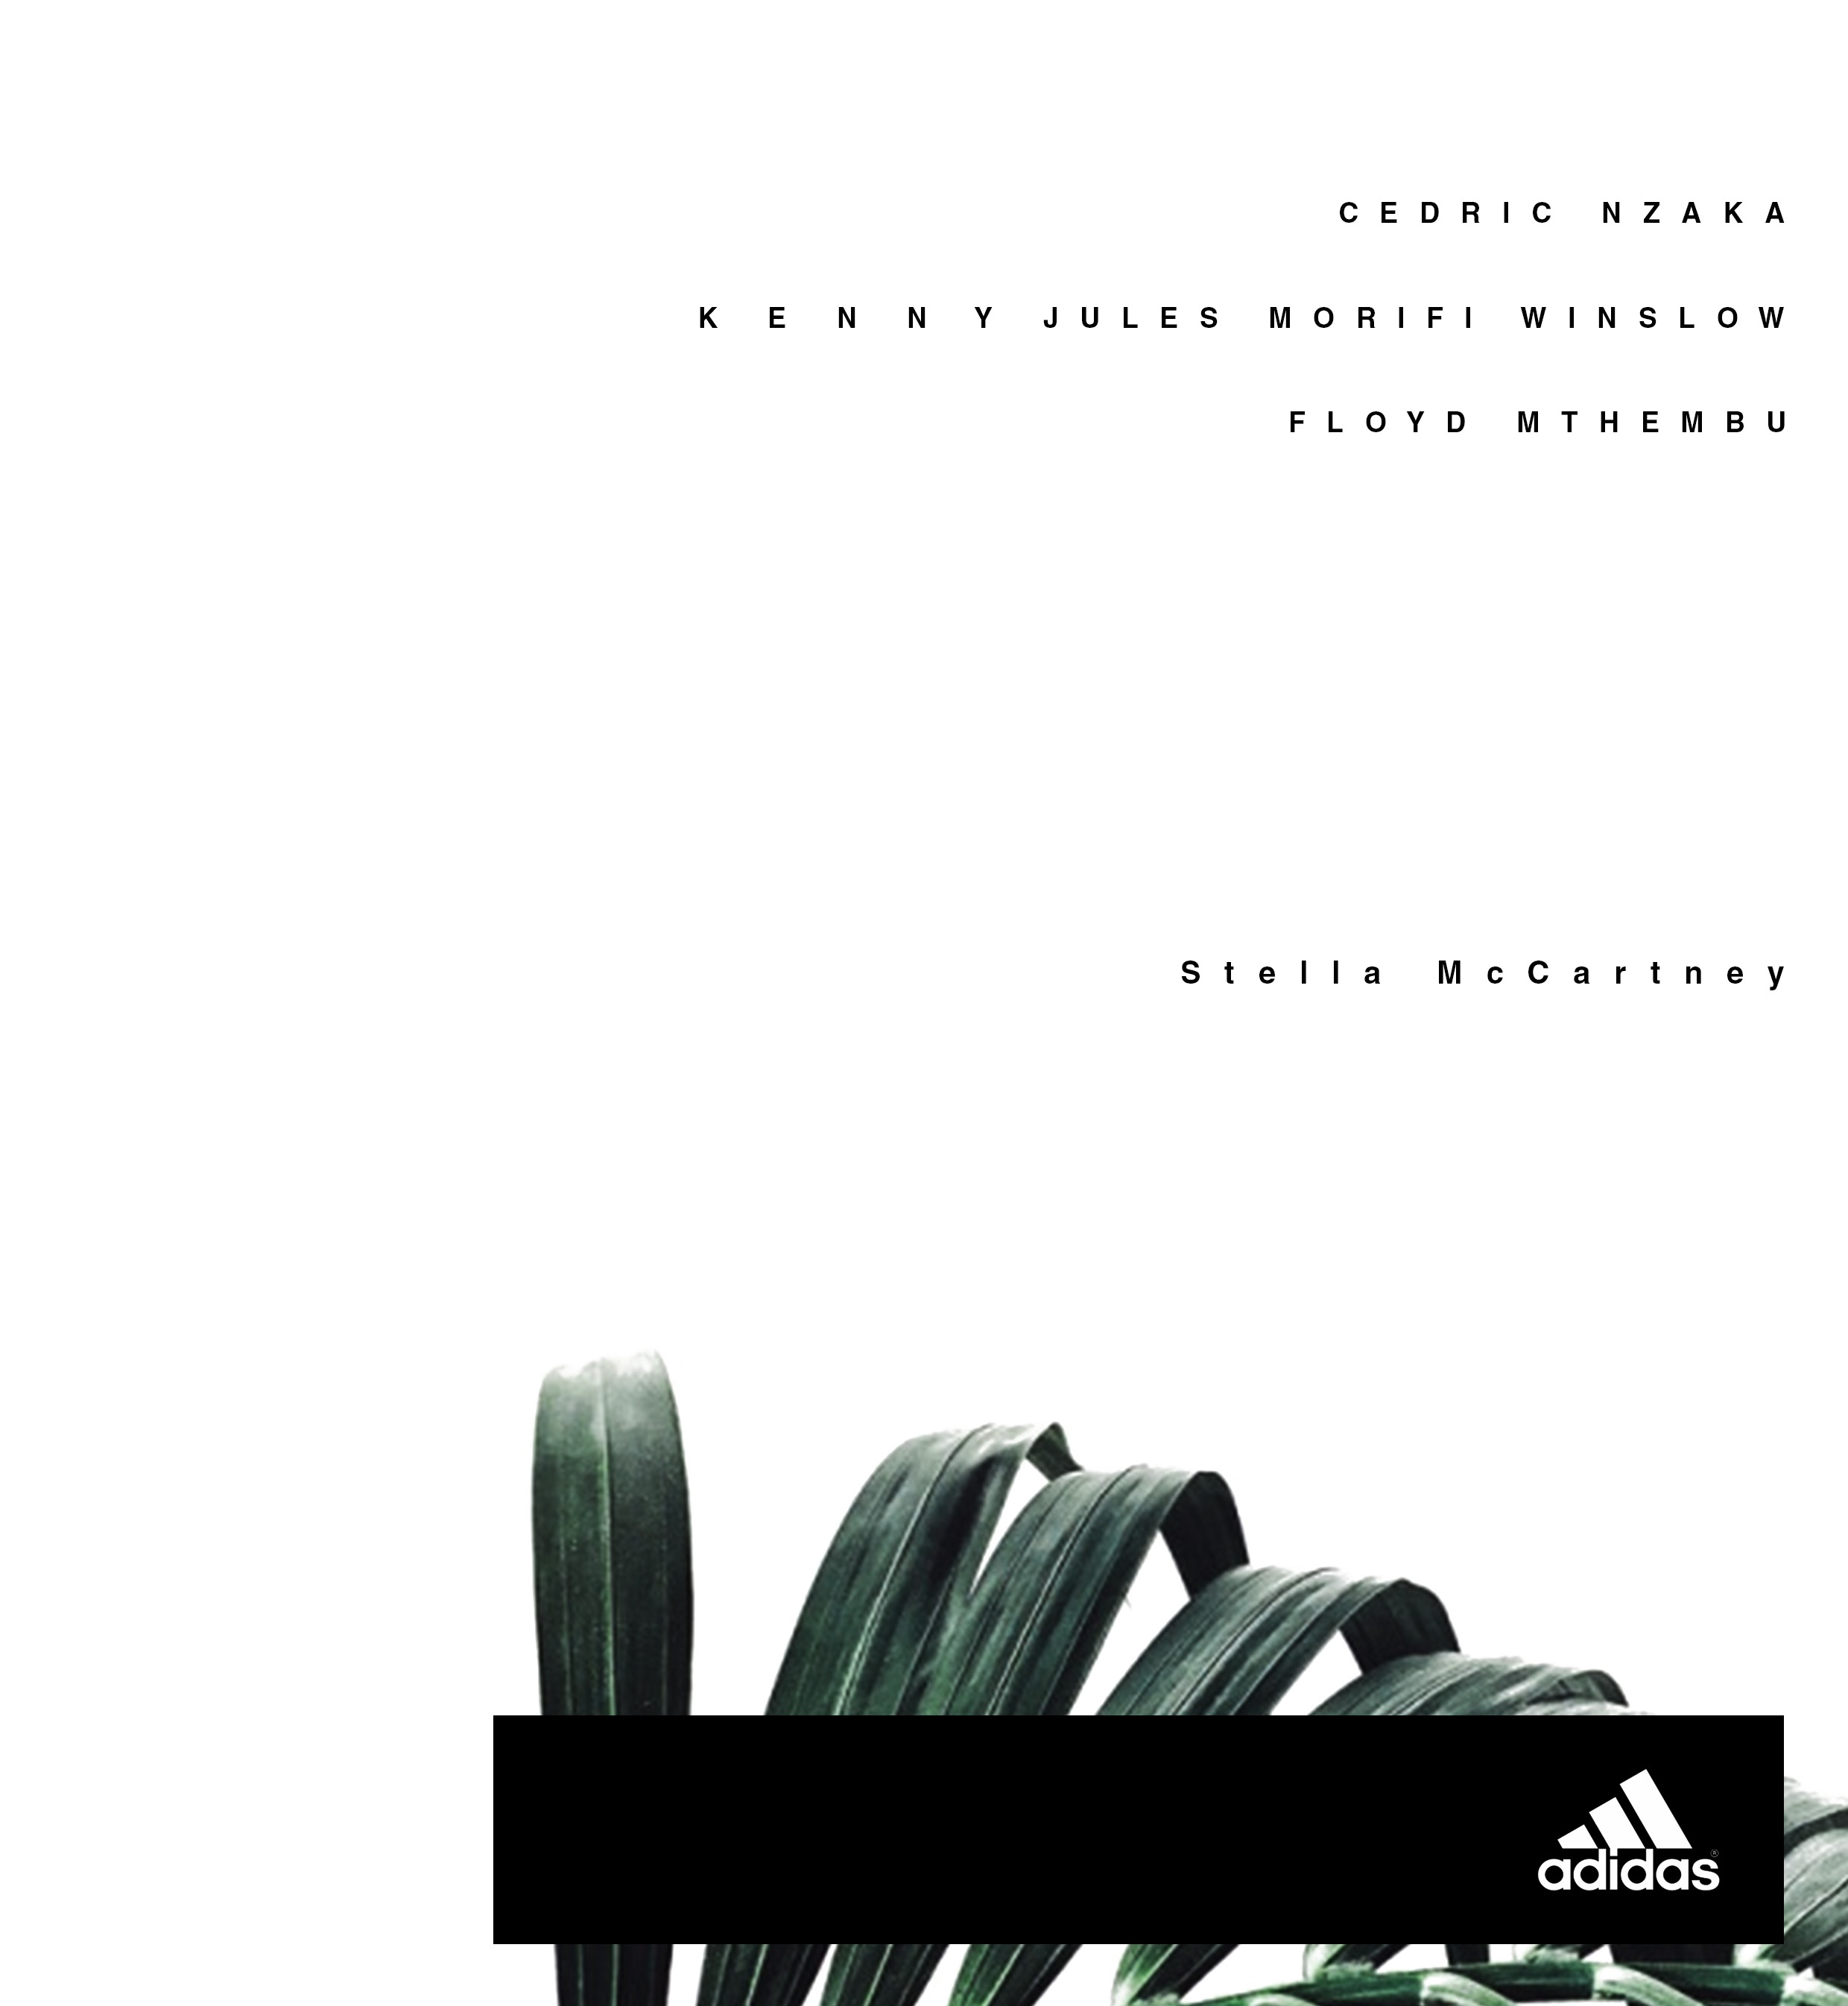 Athleisure & the High Fashion Collaboration: Adidas x Stella